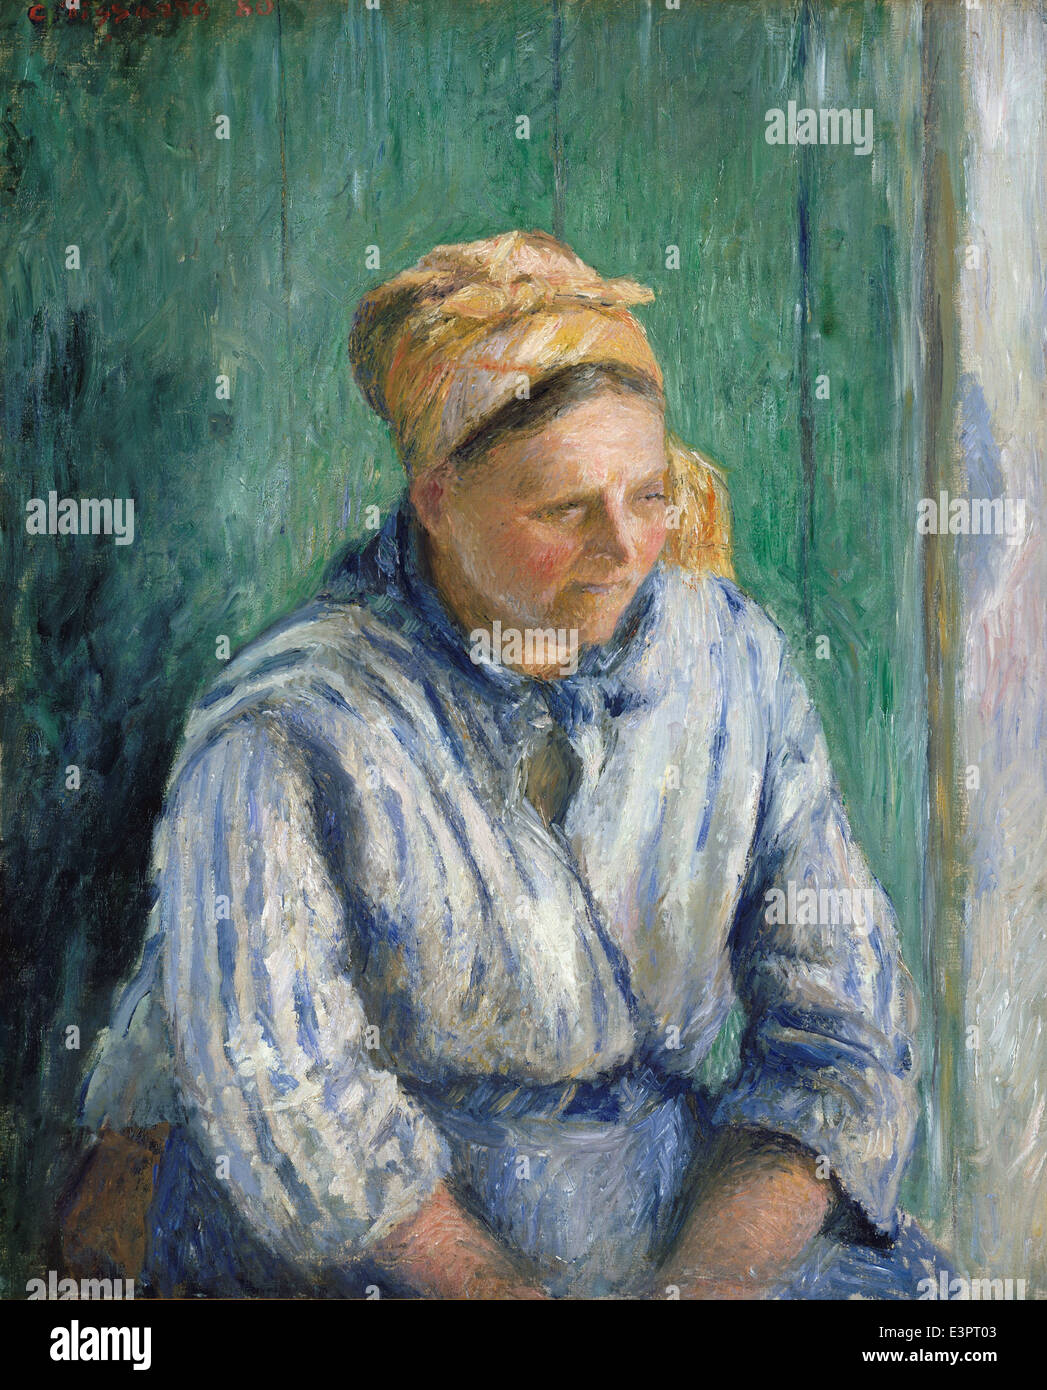 Camille Pissarro - lavandaia, Studio - 1880 Immagini Stock